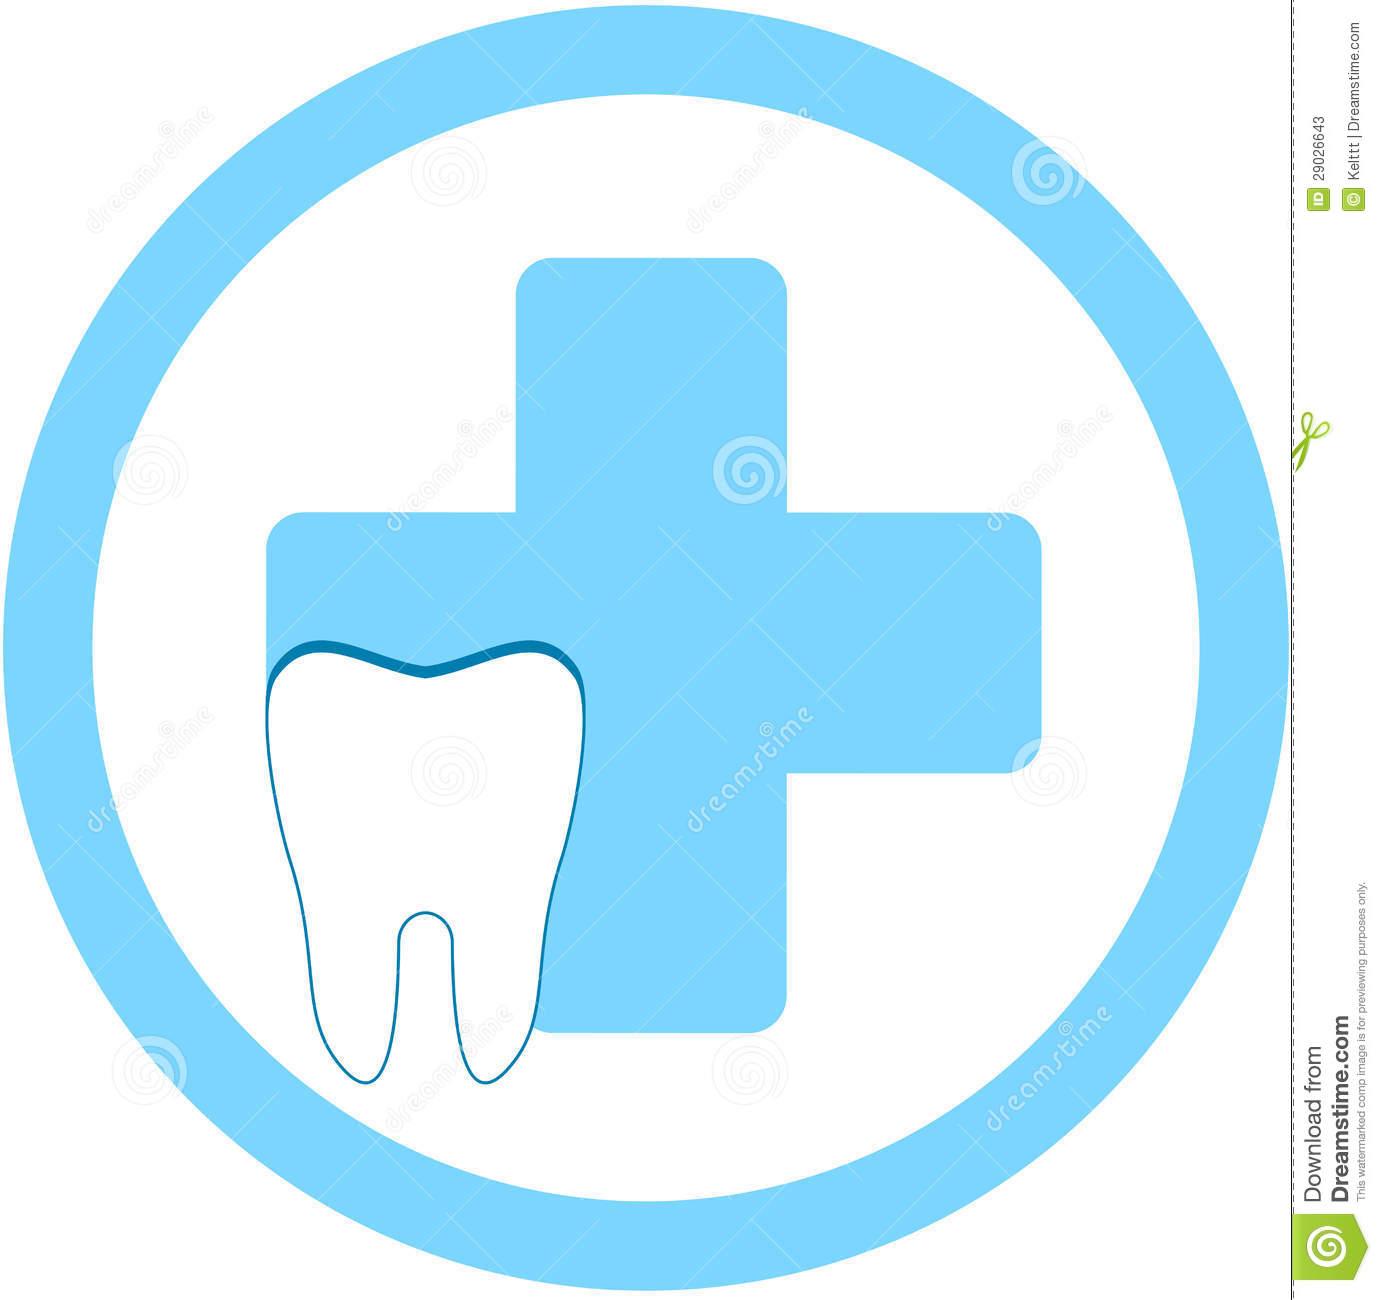 Teeth clipart symbol Clinic Clinic Symbol clipart Dental